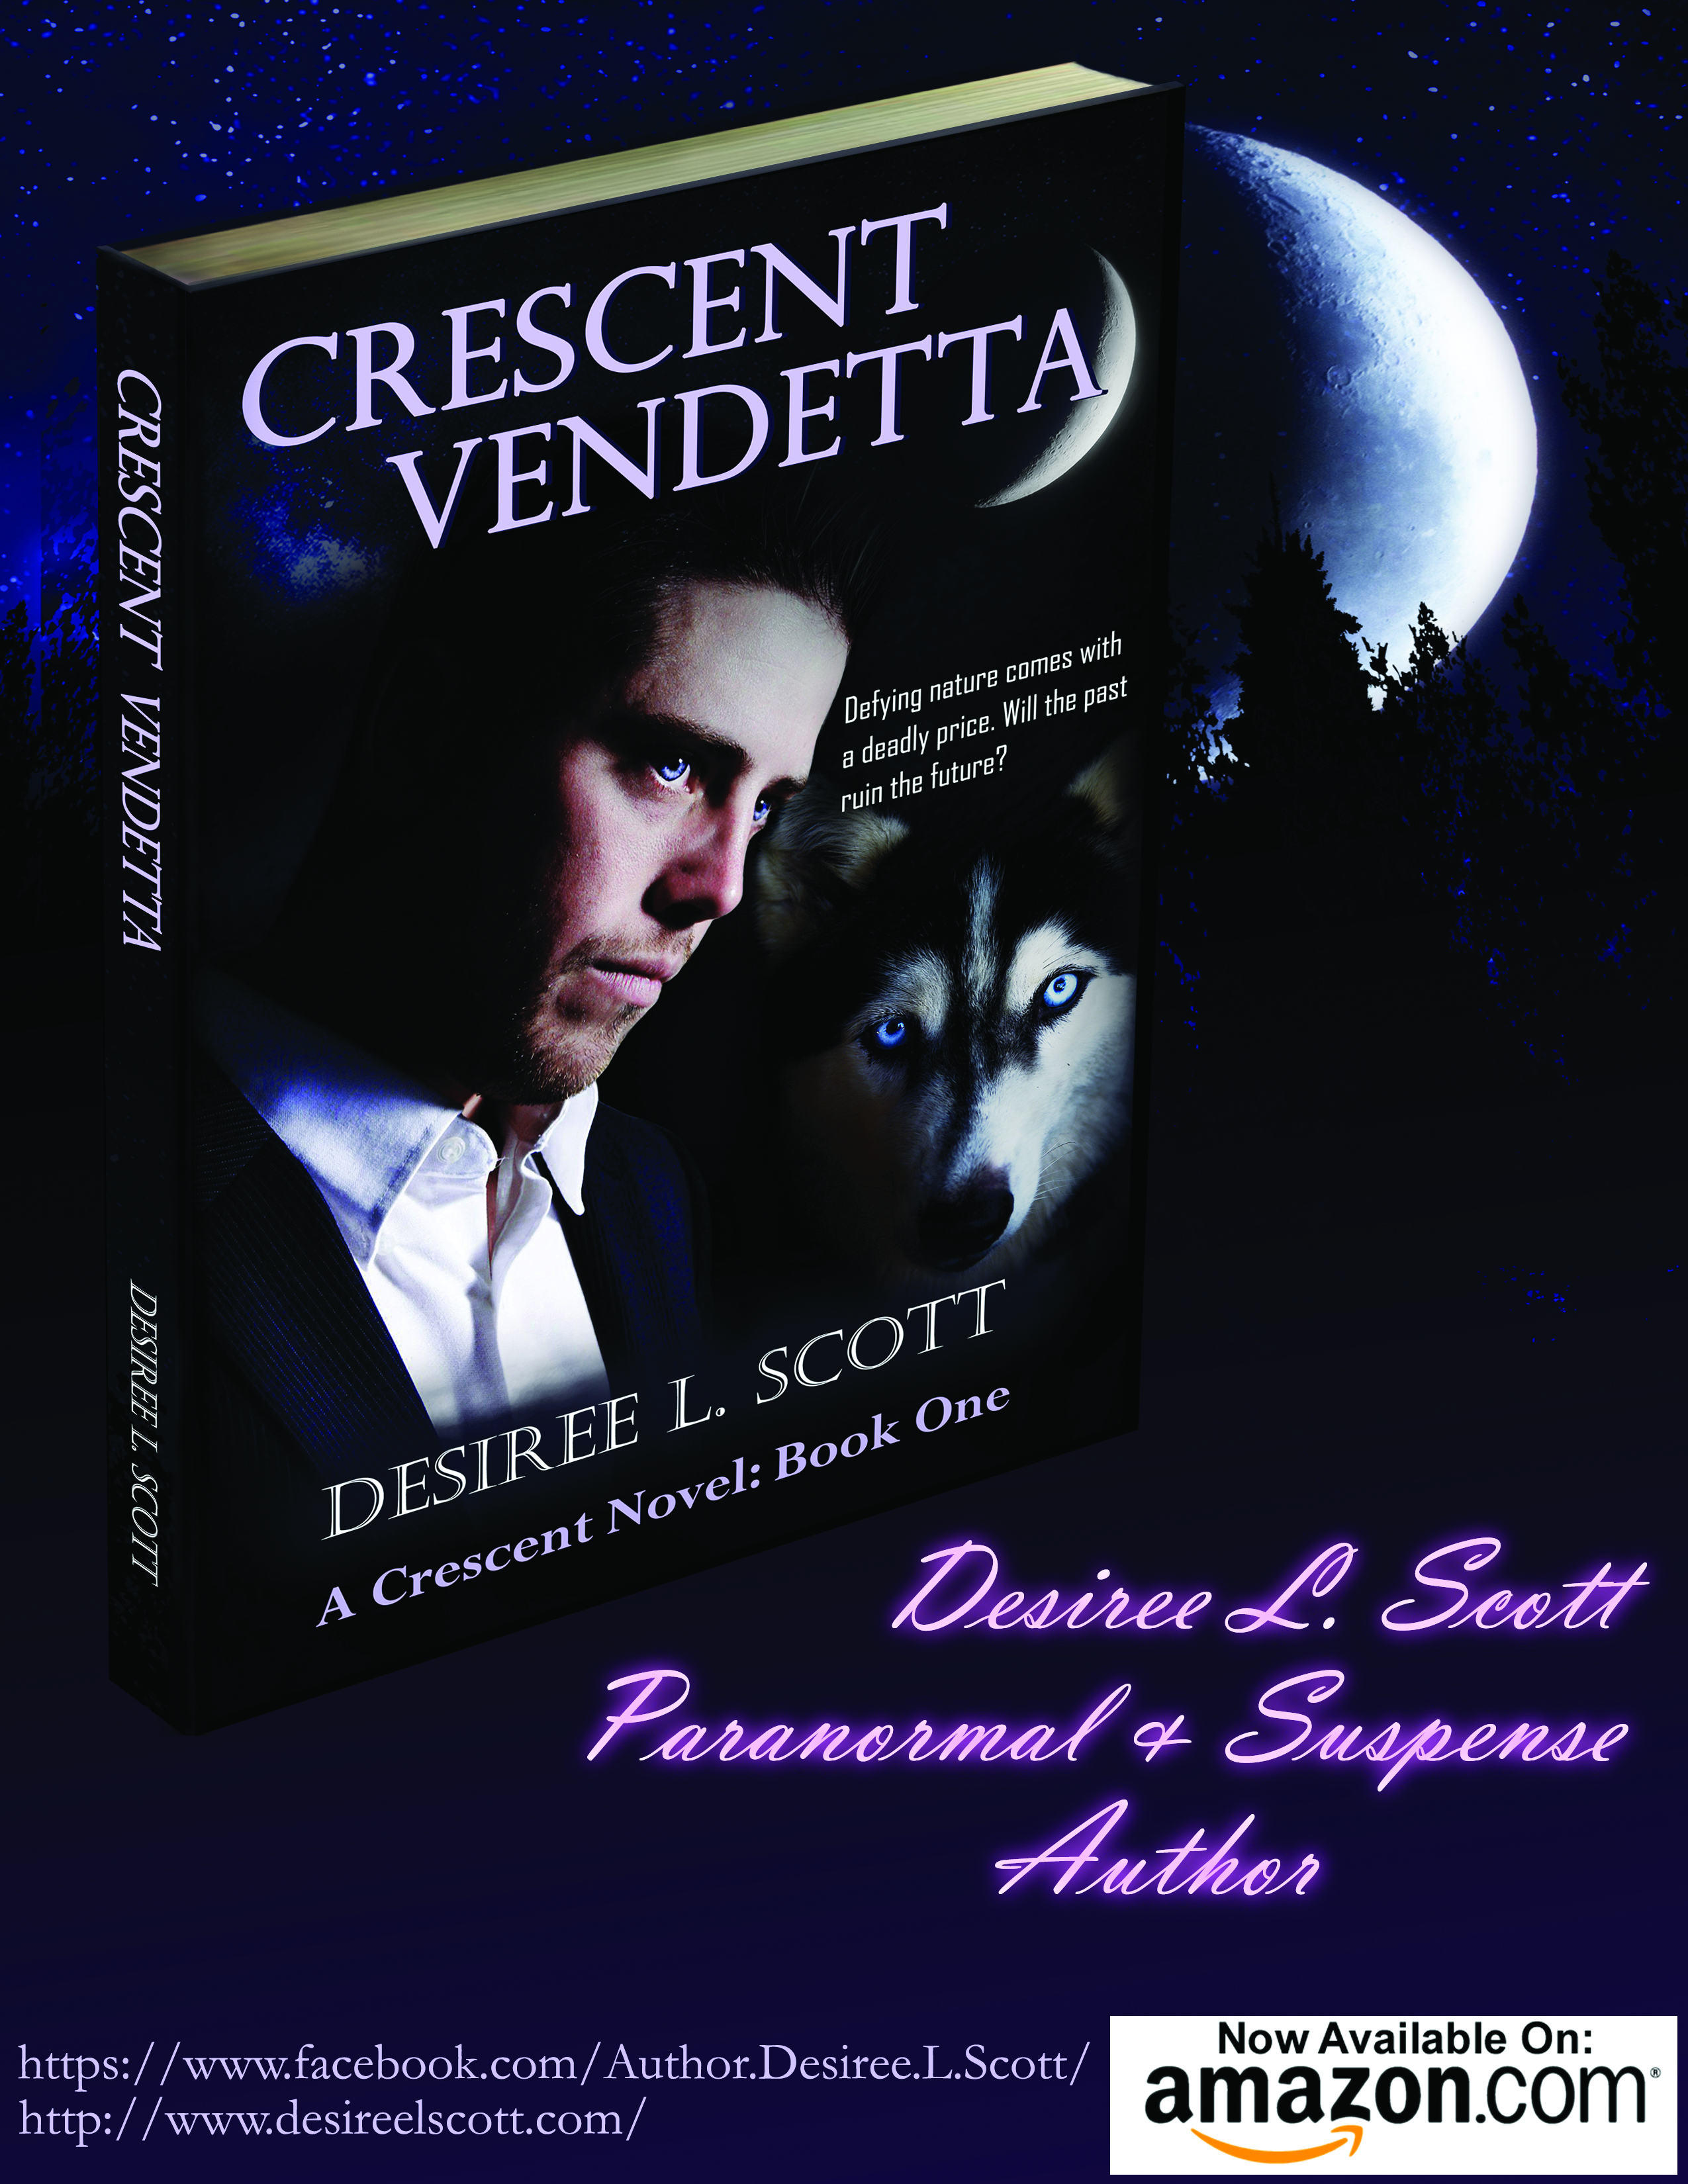 Crescent Vendetta Poster 8halfX11.jpg